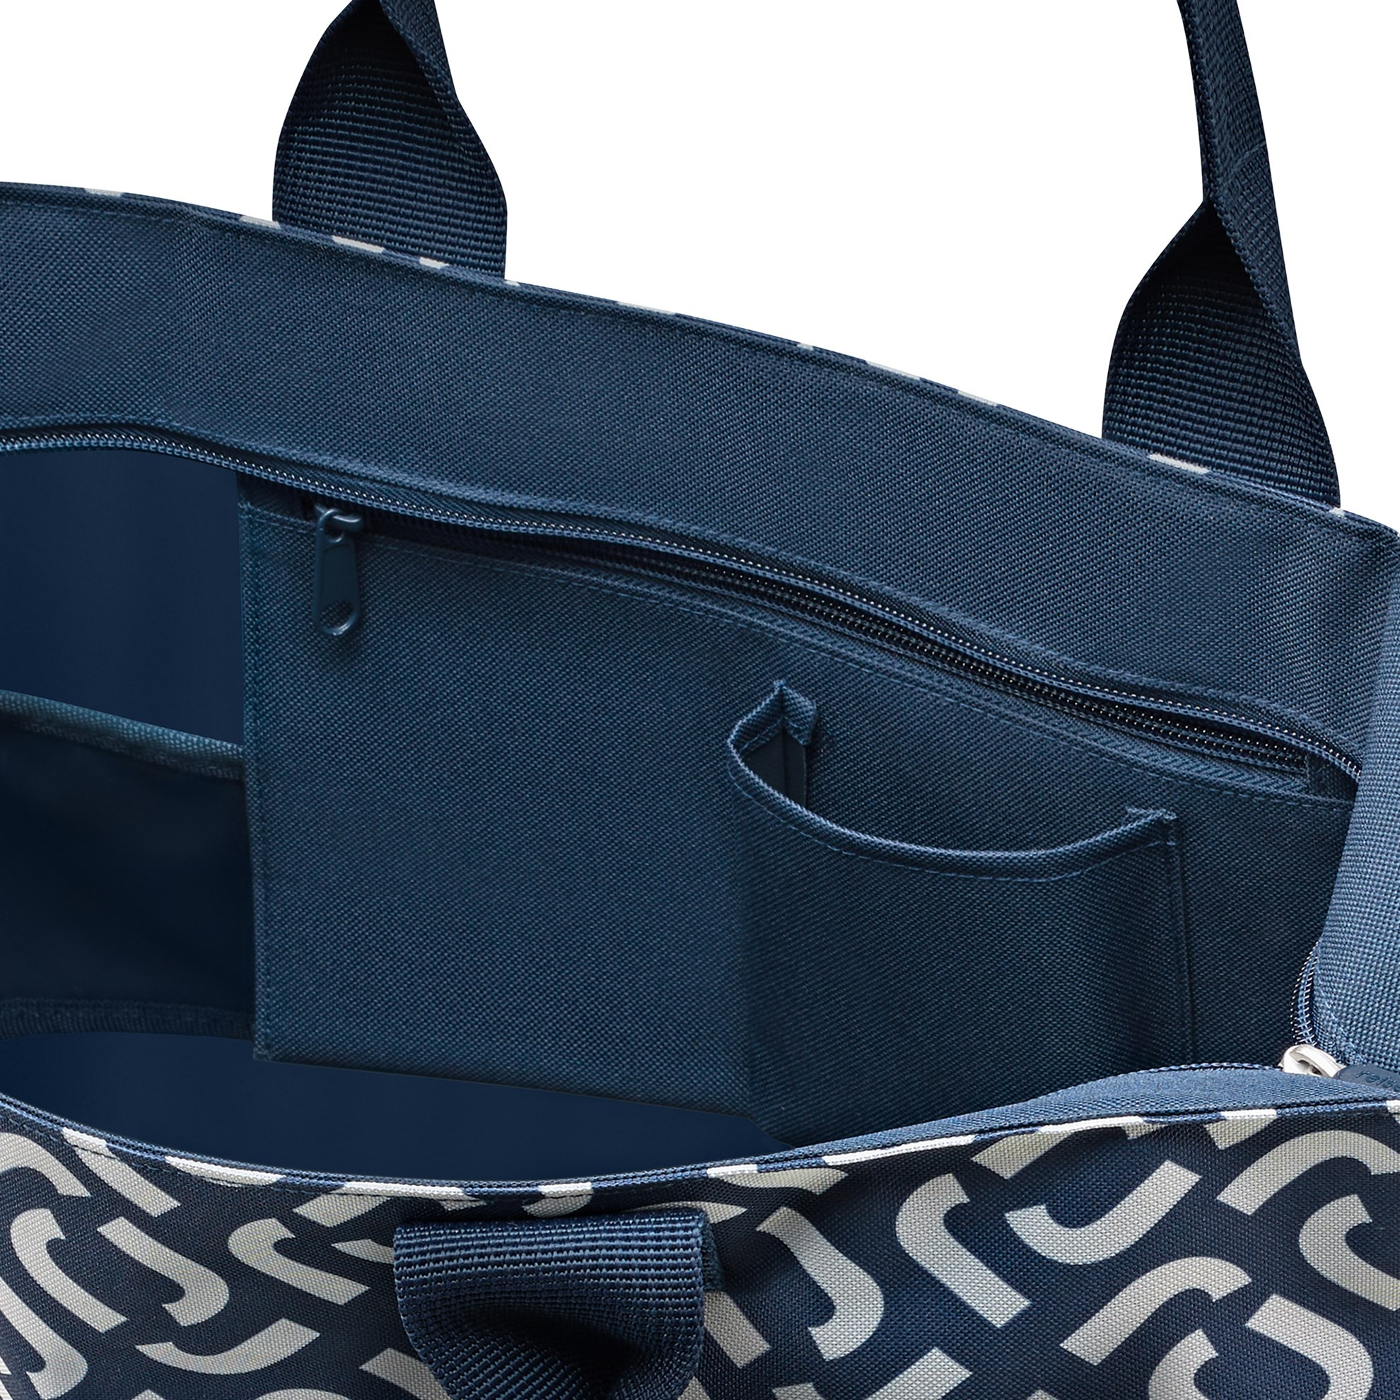 Chytrá taška přes rameno Shopper e1 signature navy_0